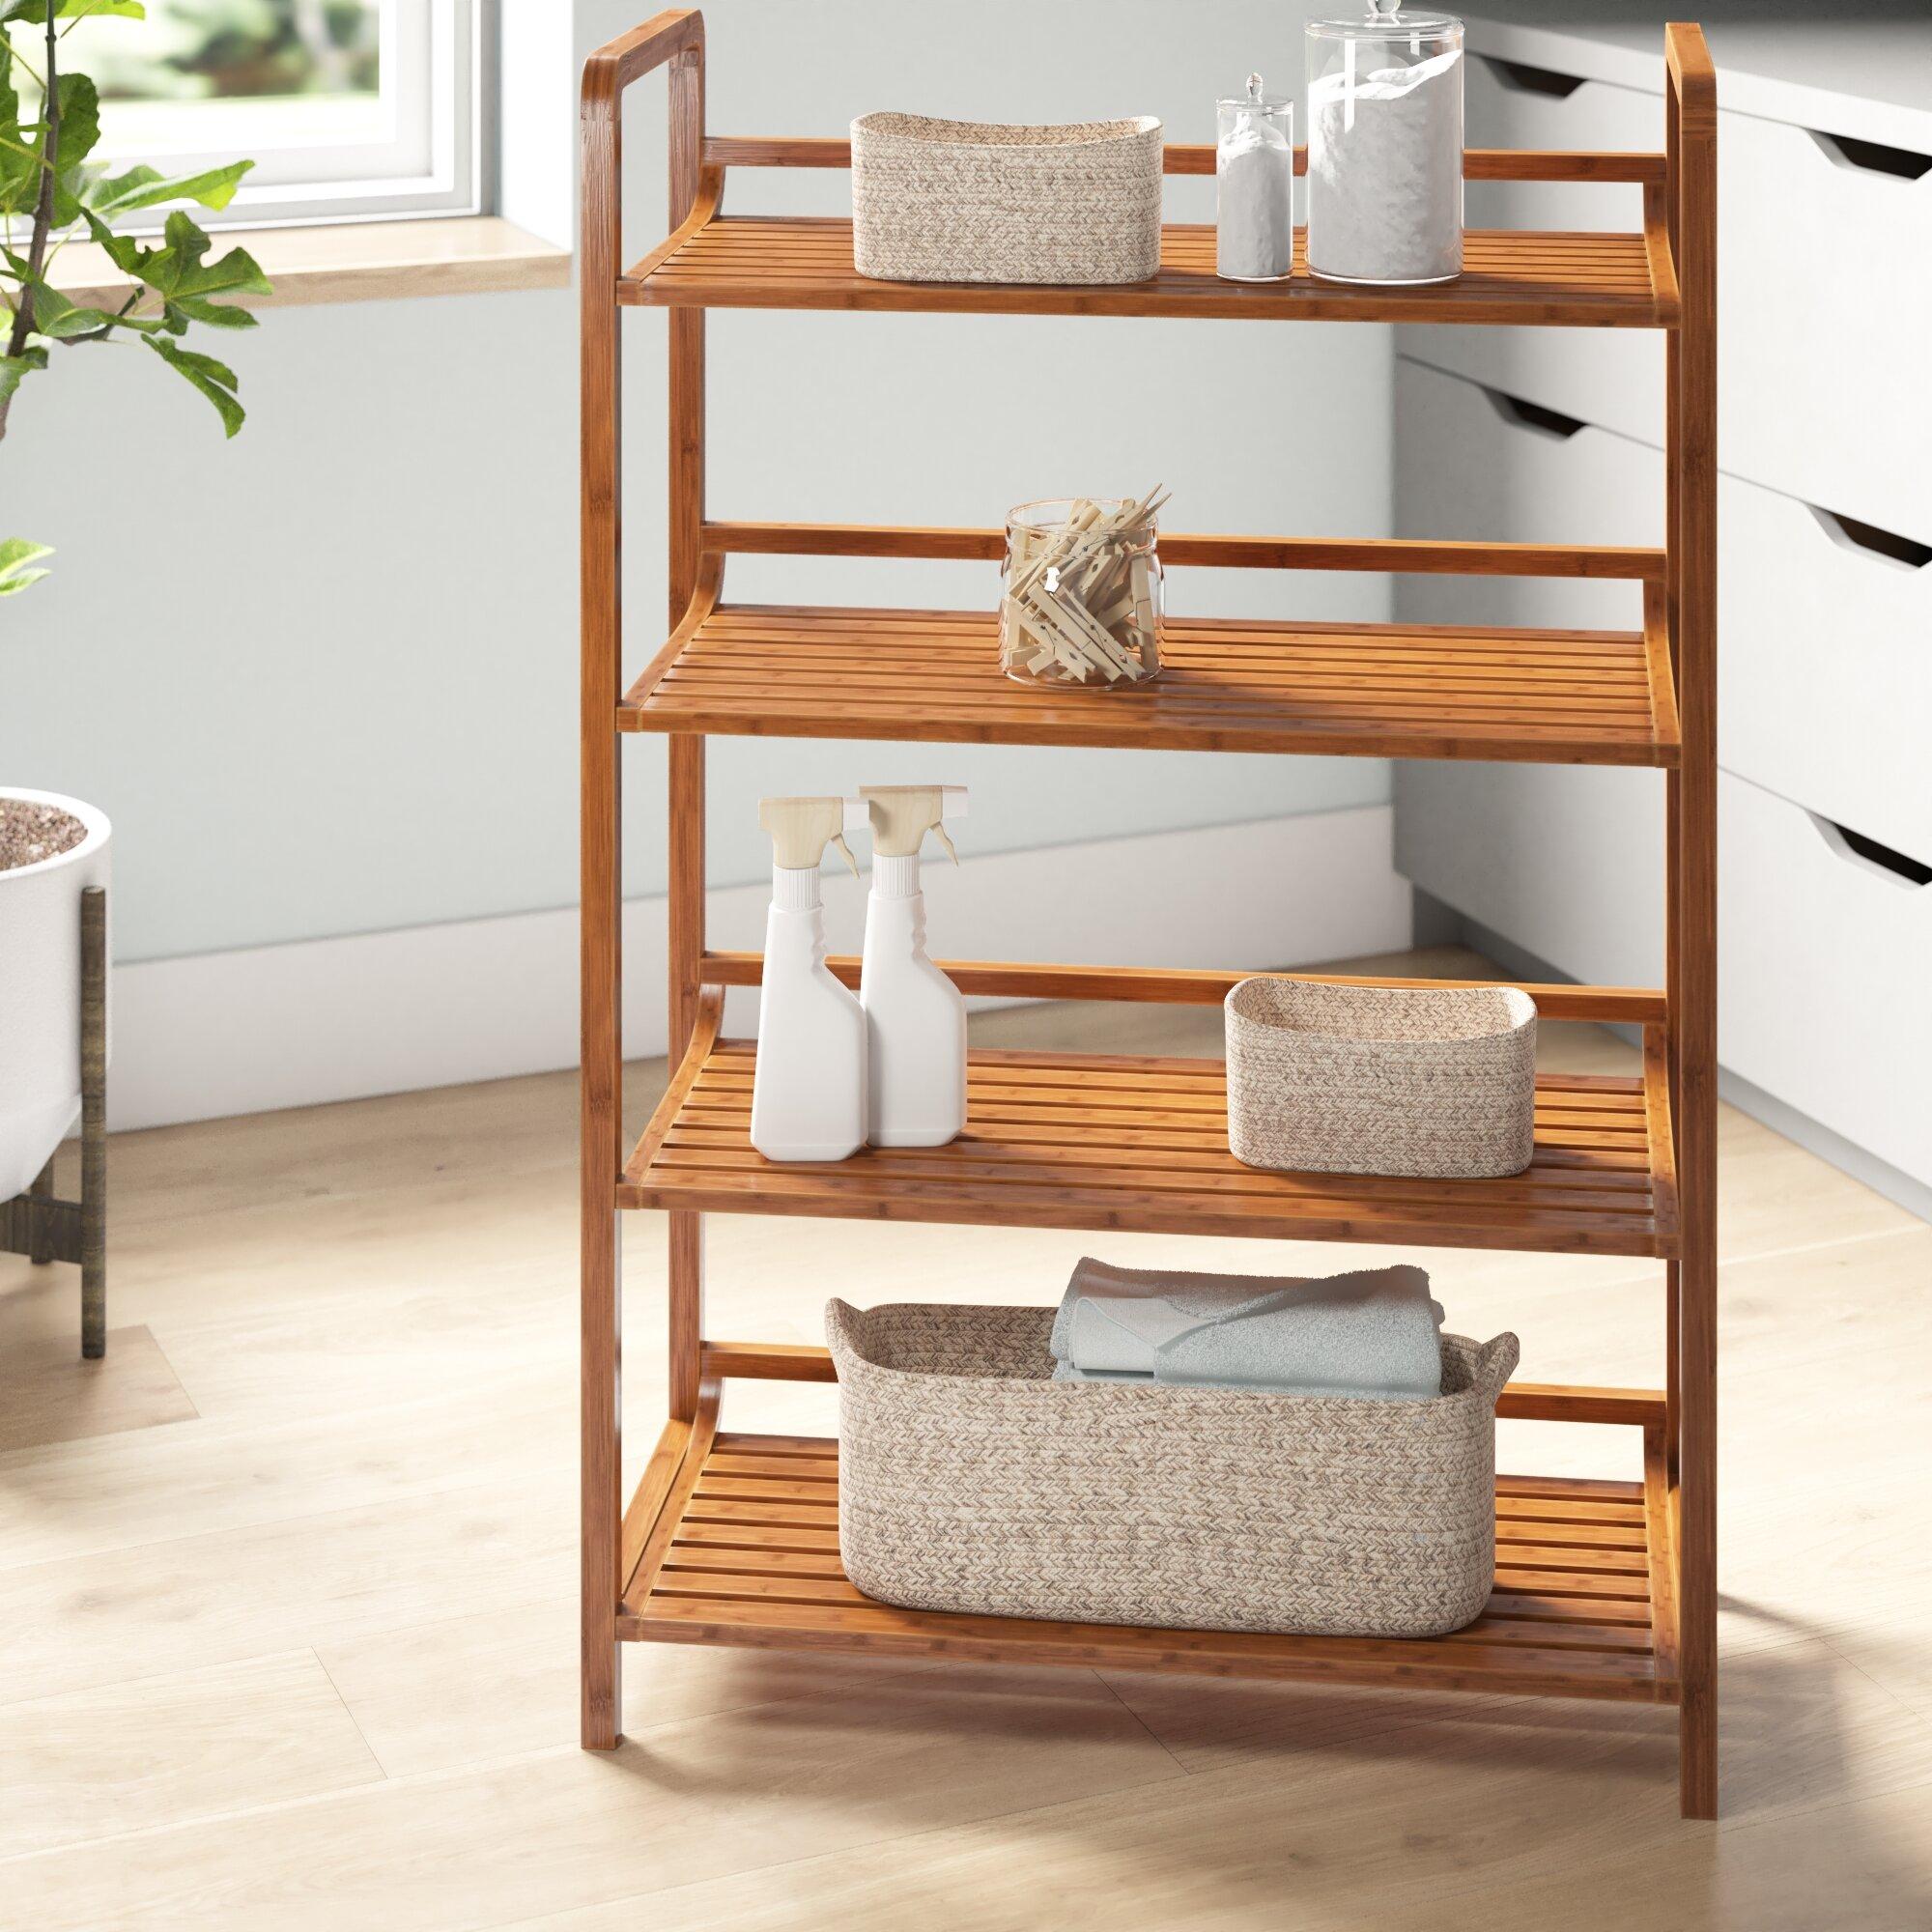 Bamboo Shelving Bathroom Cabinets Shelving You Ll Love In 2021 Wayfair